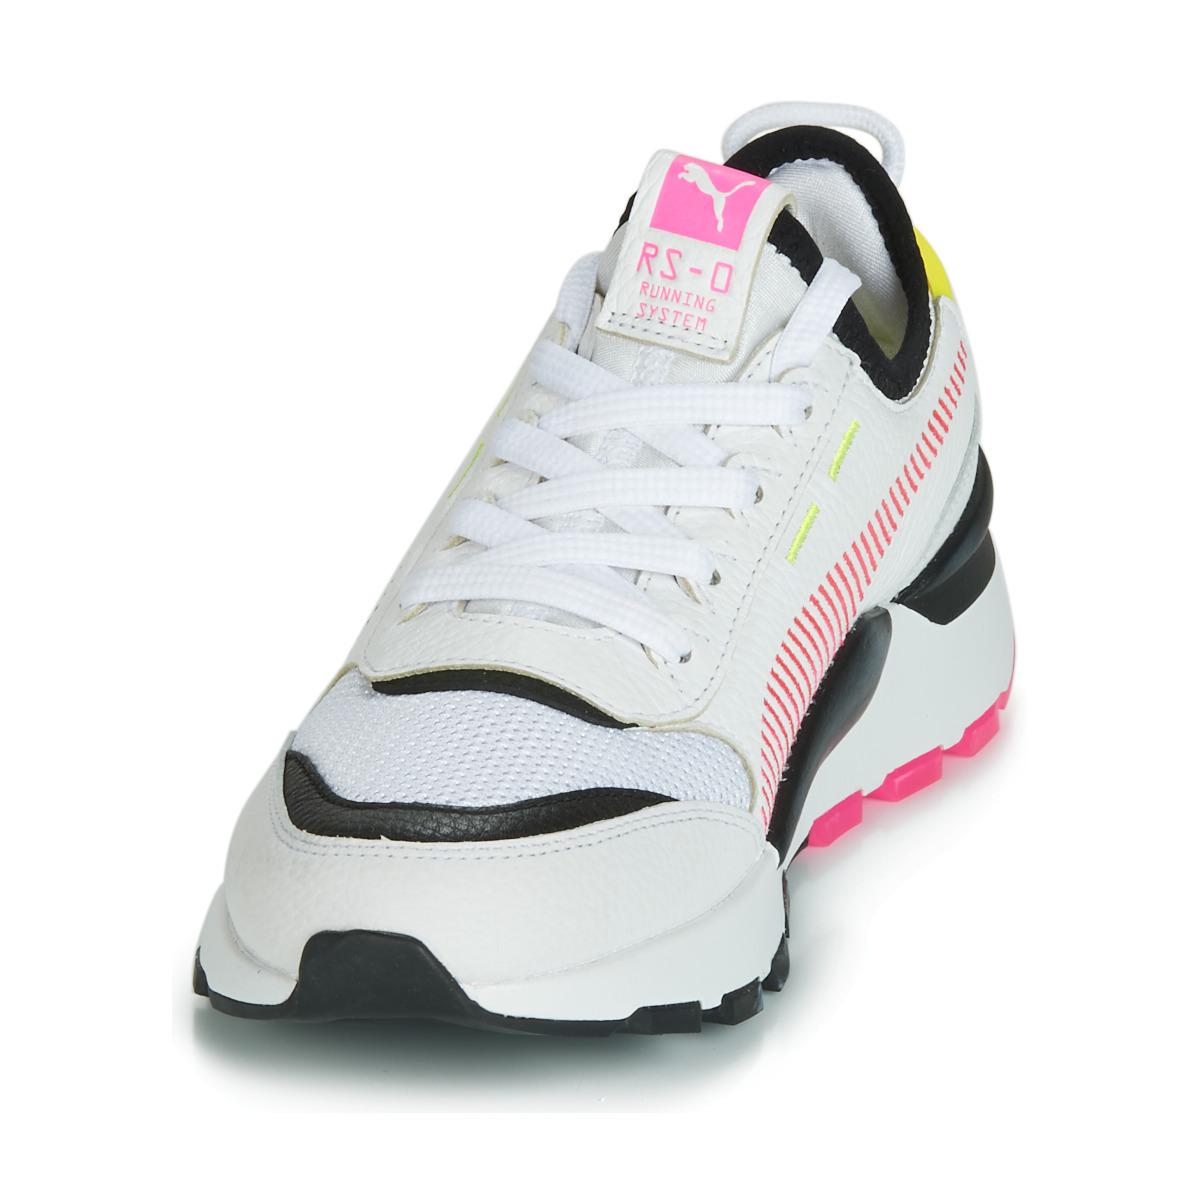 puma running sistem donna scarpe